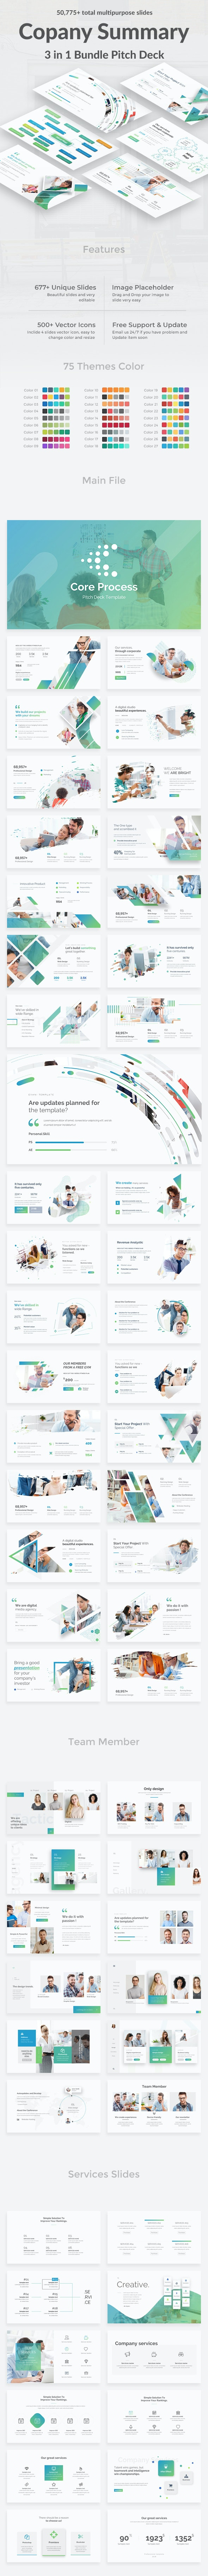 Company Summary 3 in 1 Pitch Deck Bundle Google Slide Template - Google Slides Presentation Templates